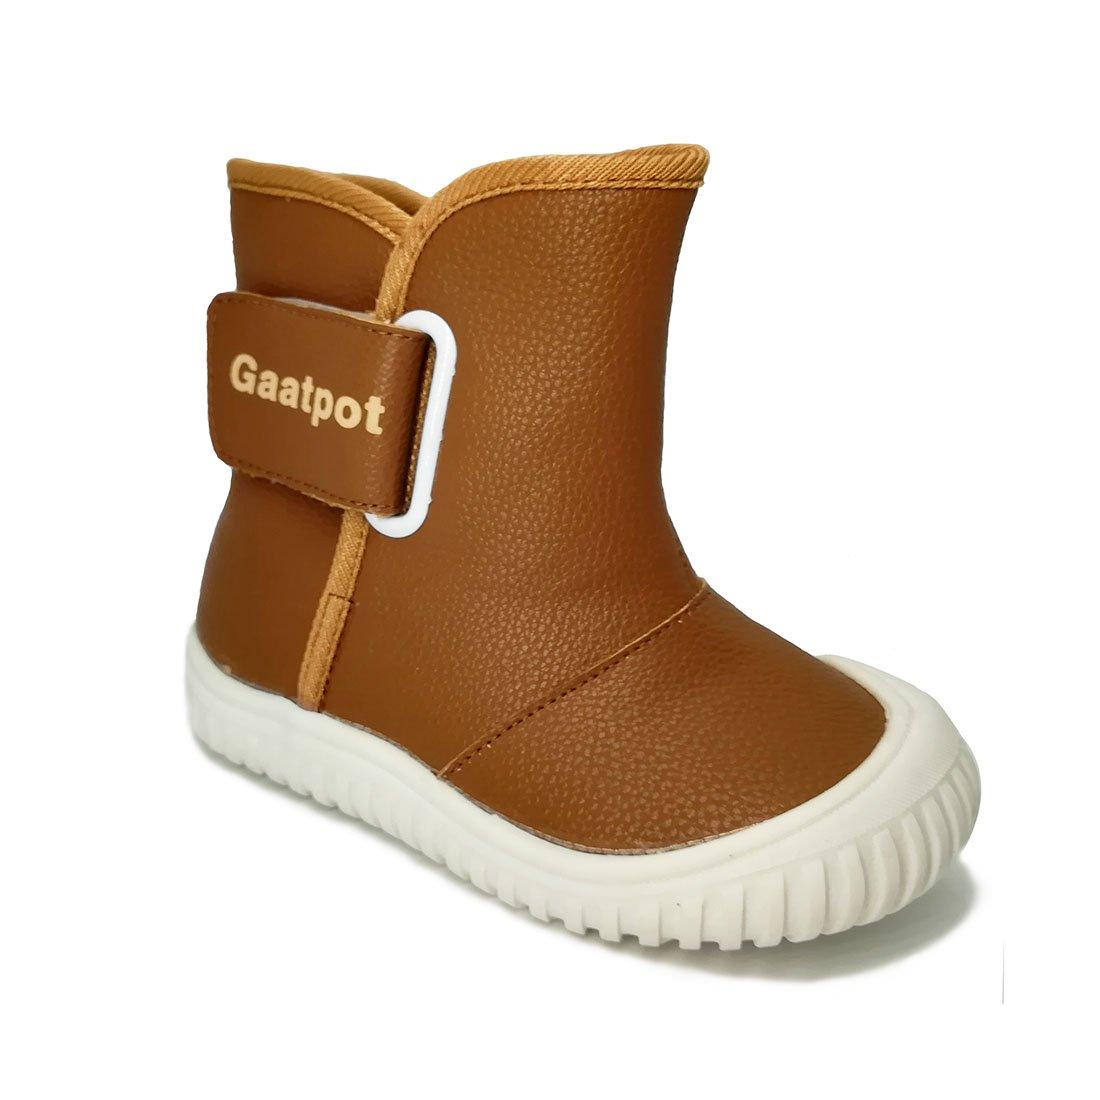 Oderola Baby Faux Fleece Winter Boots Toddler Boys' Waterproof Warm Snow Boots